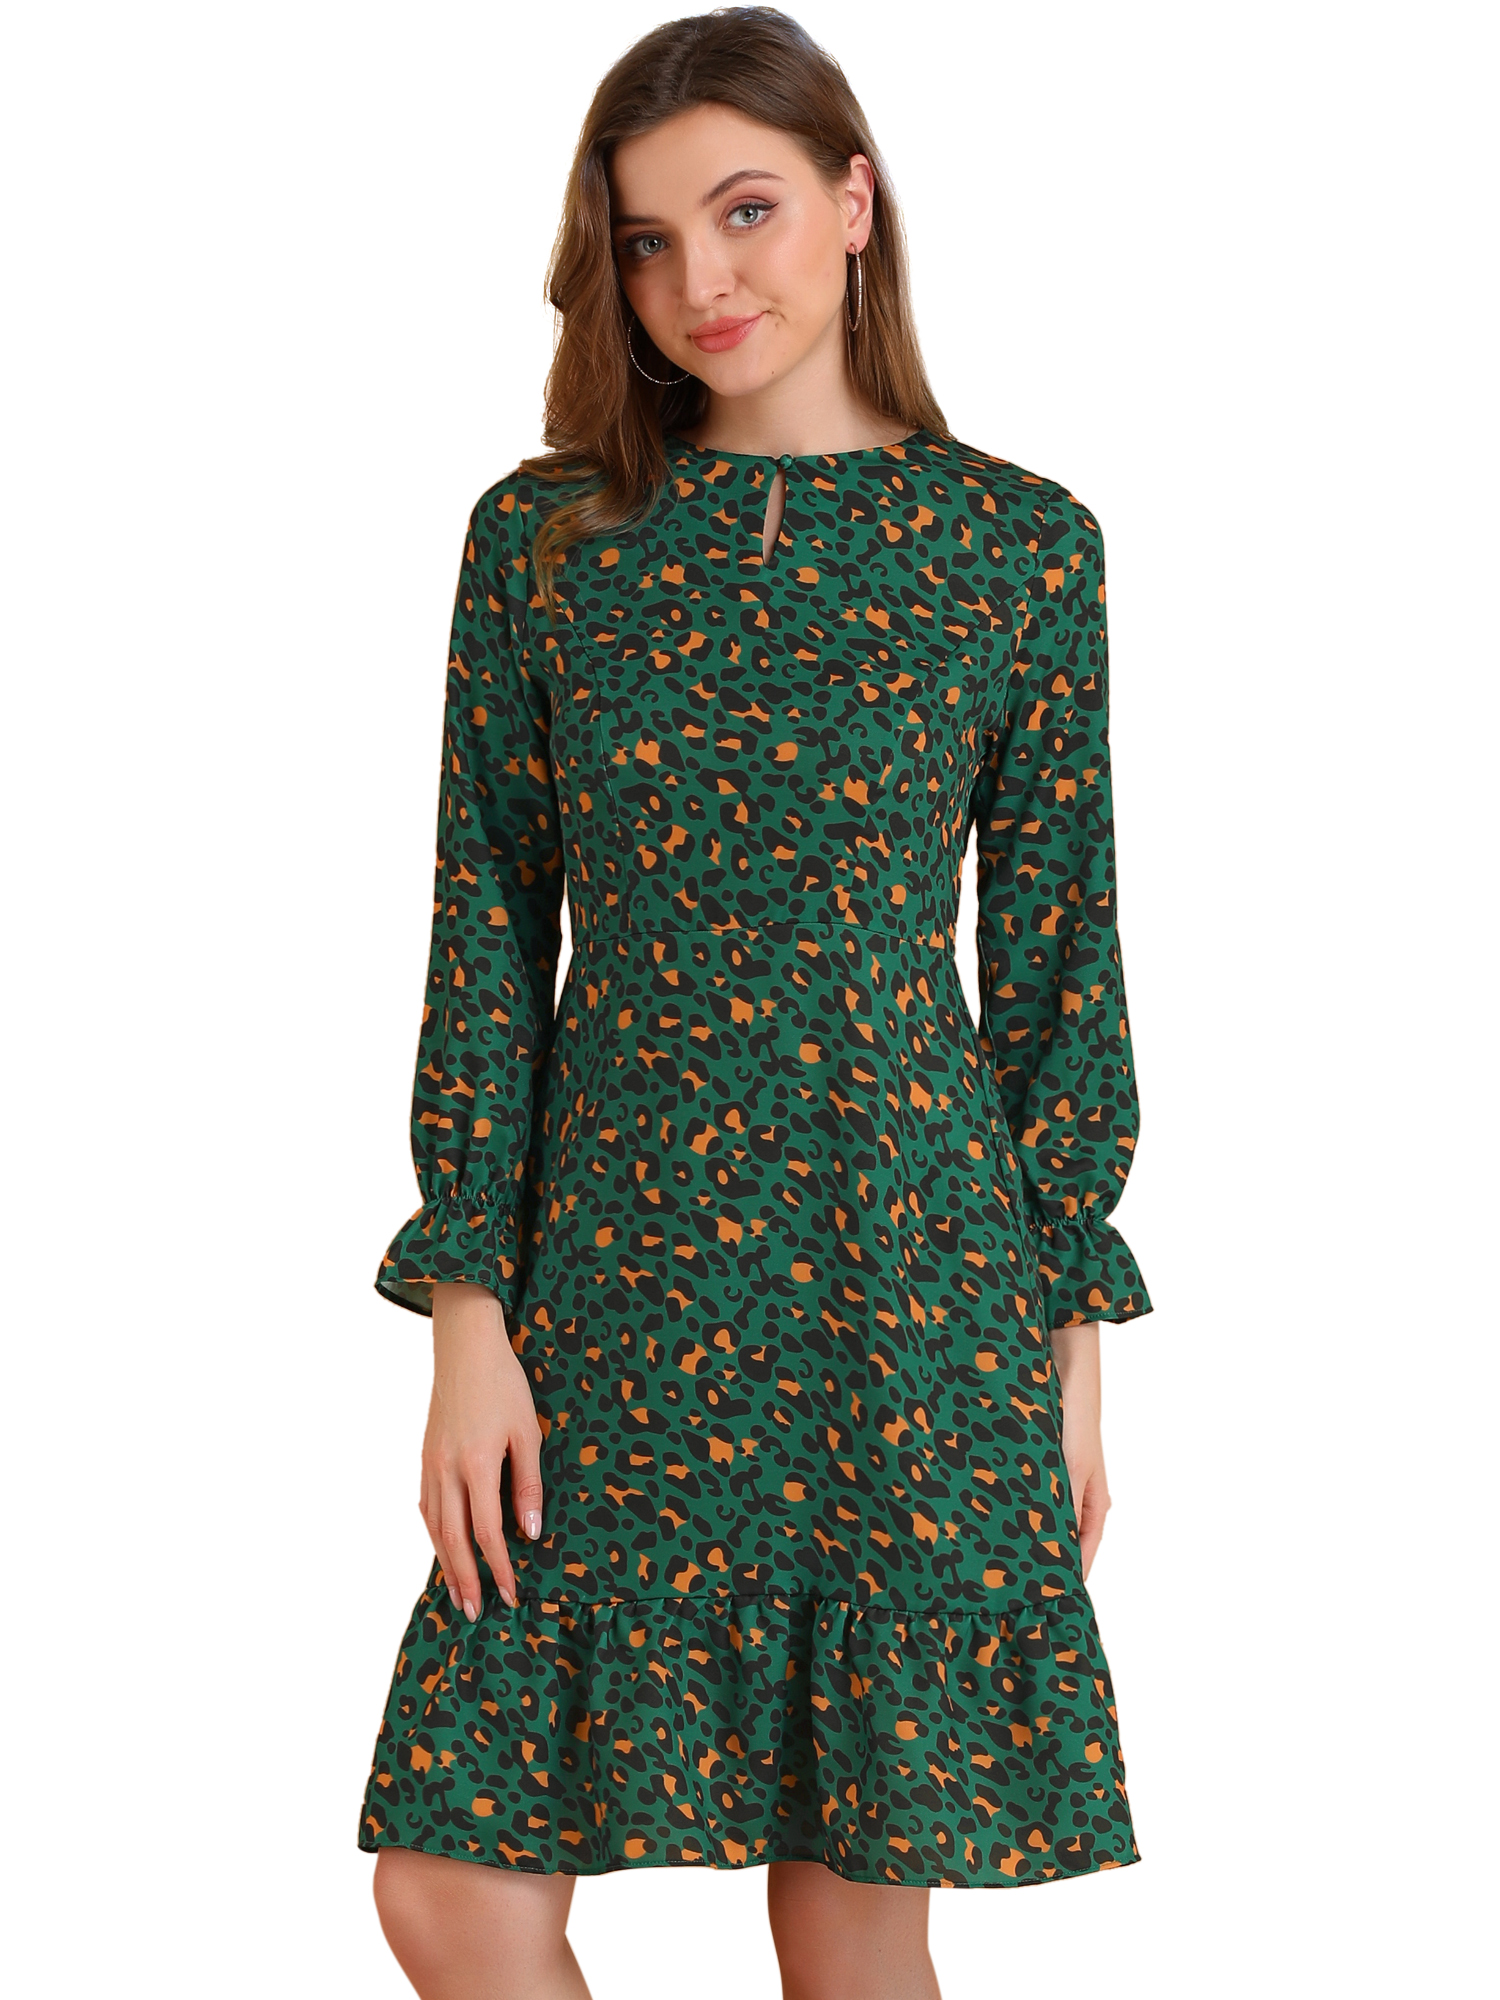 Women's Leopard Print Long Sleeve Keyhole Ruffle Hem Dress Green XL (US 18)